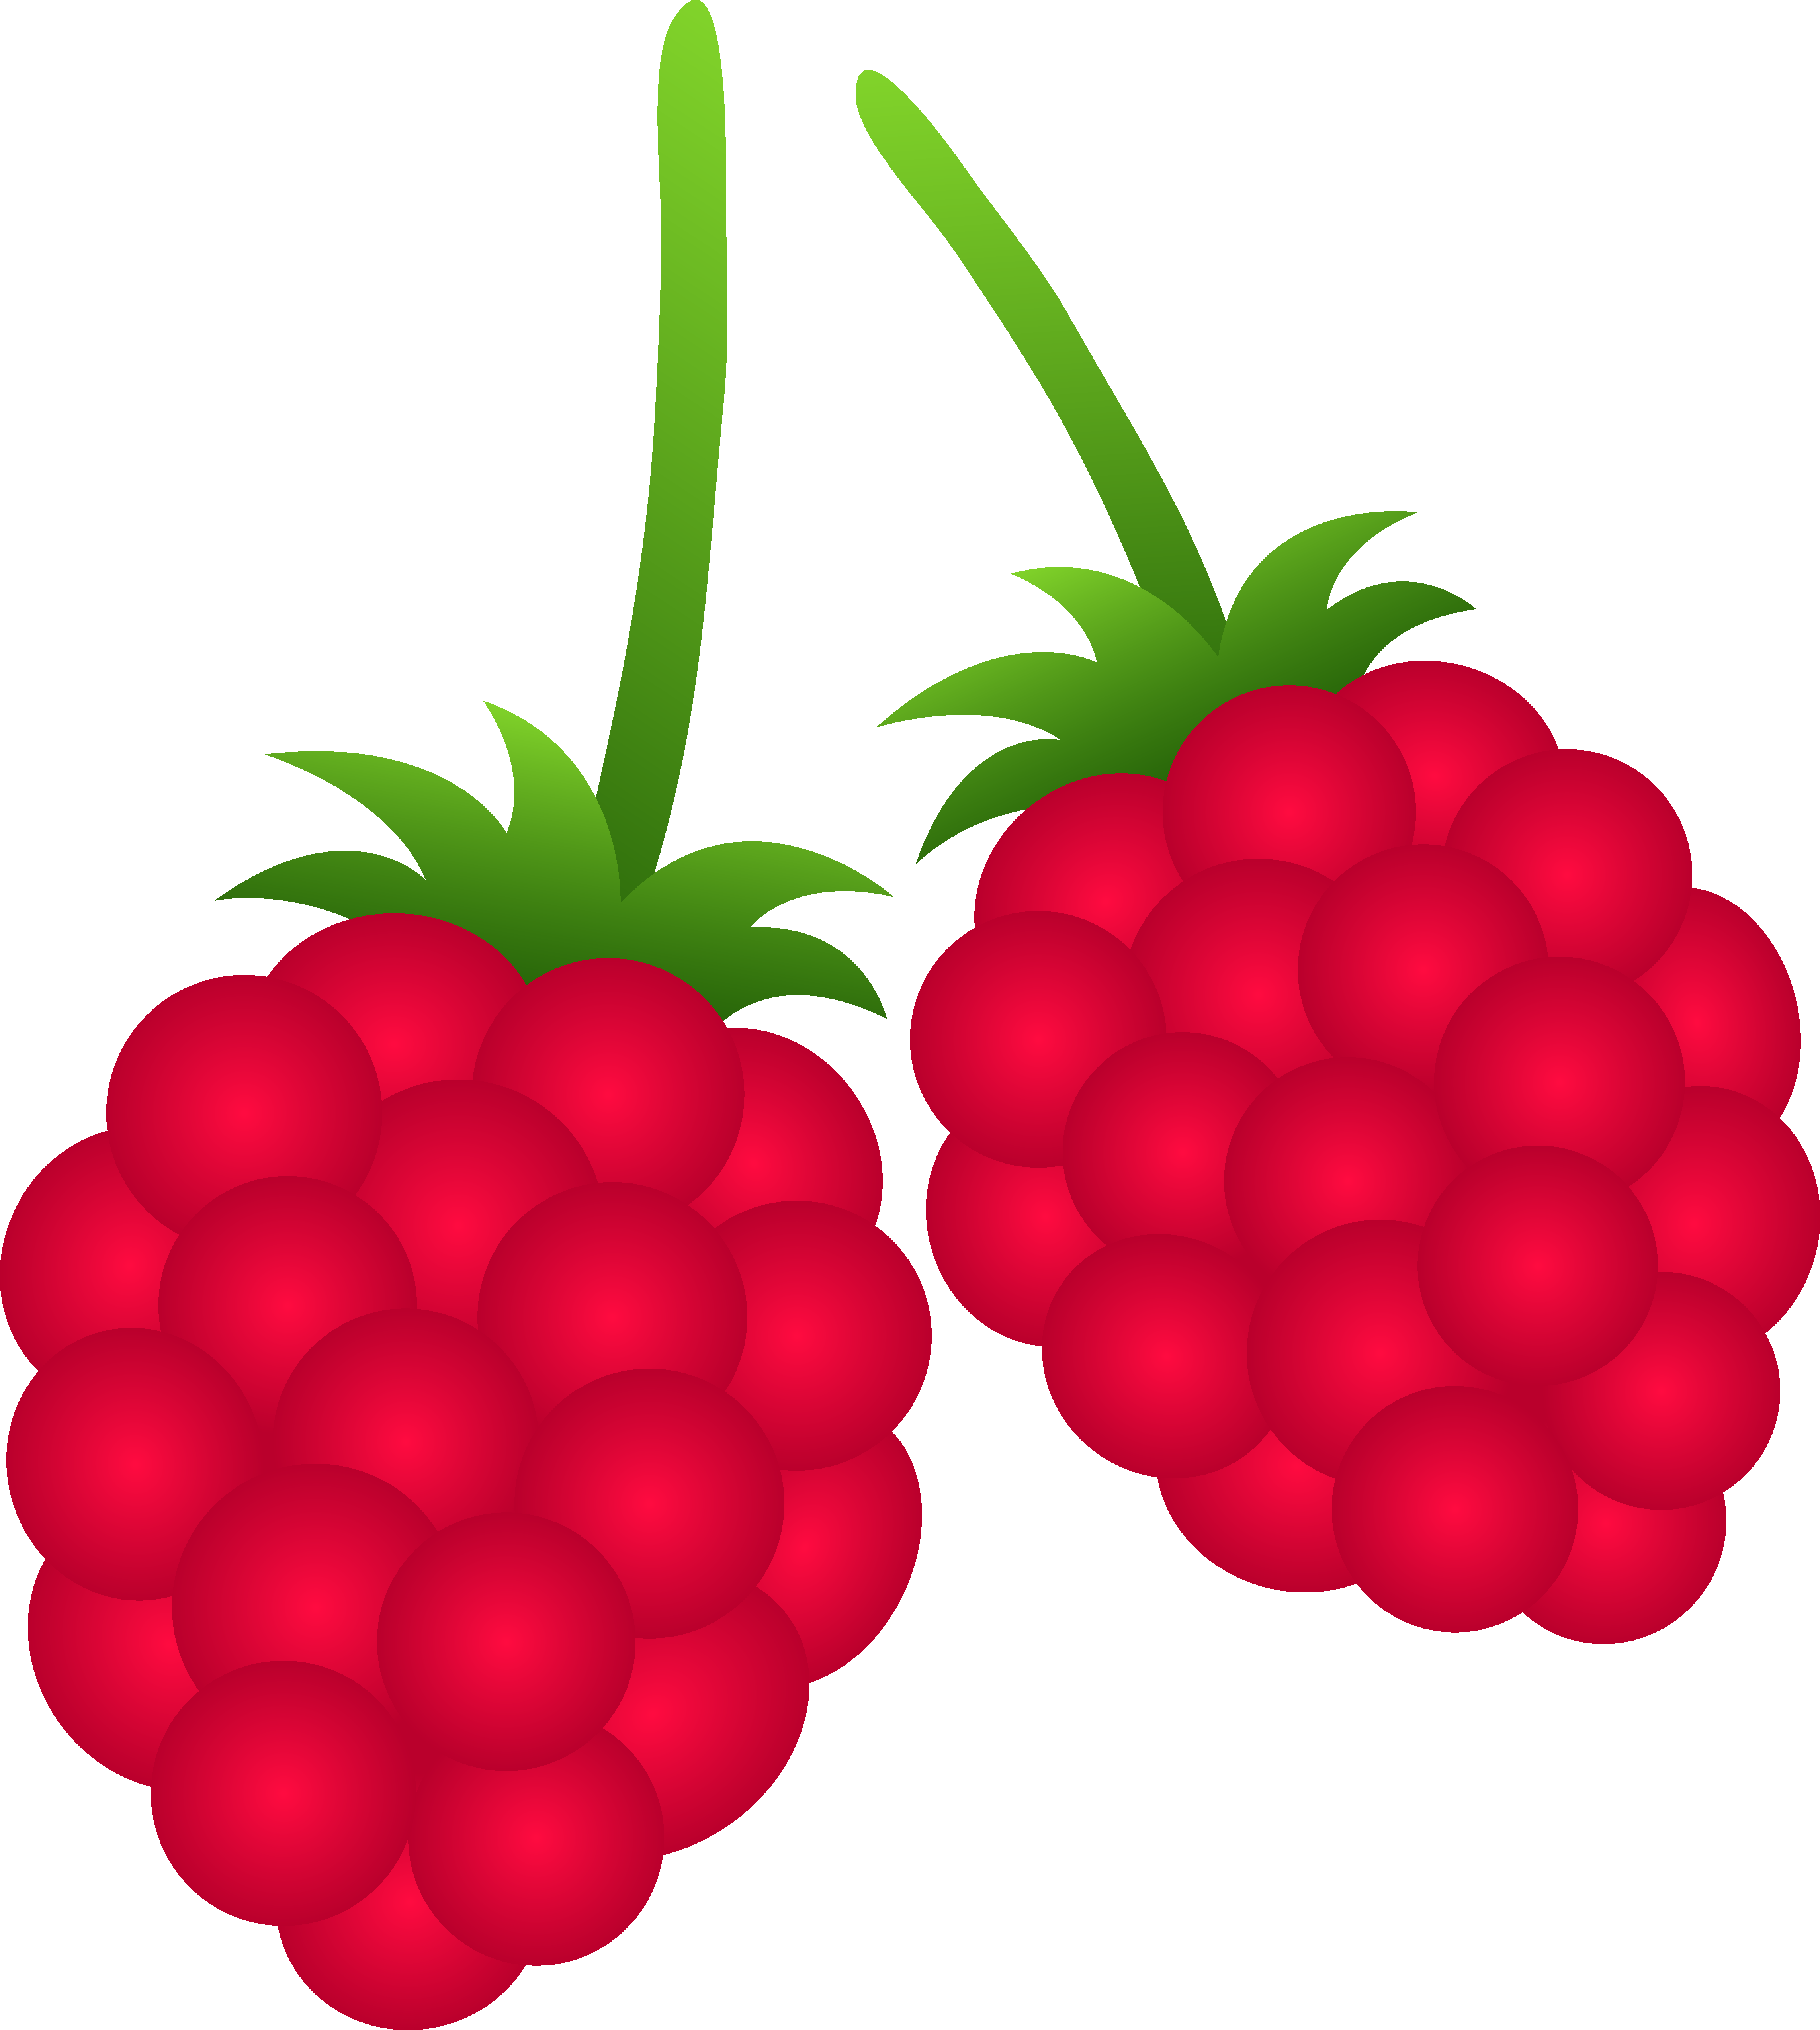 Two raspberries free clip. Berries clipart raspberry